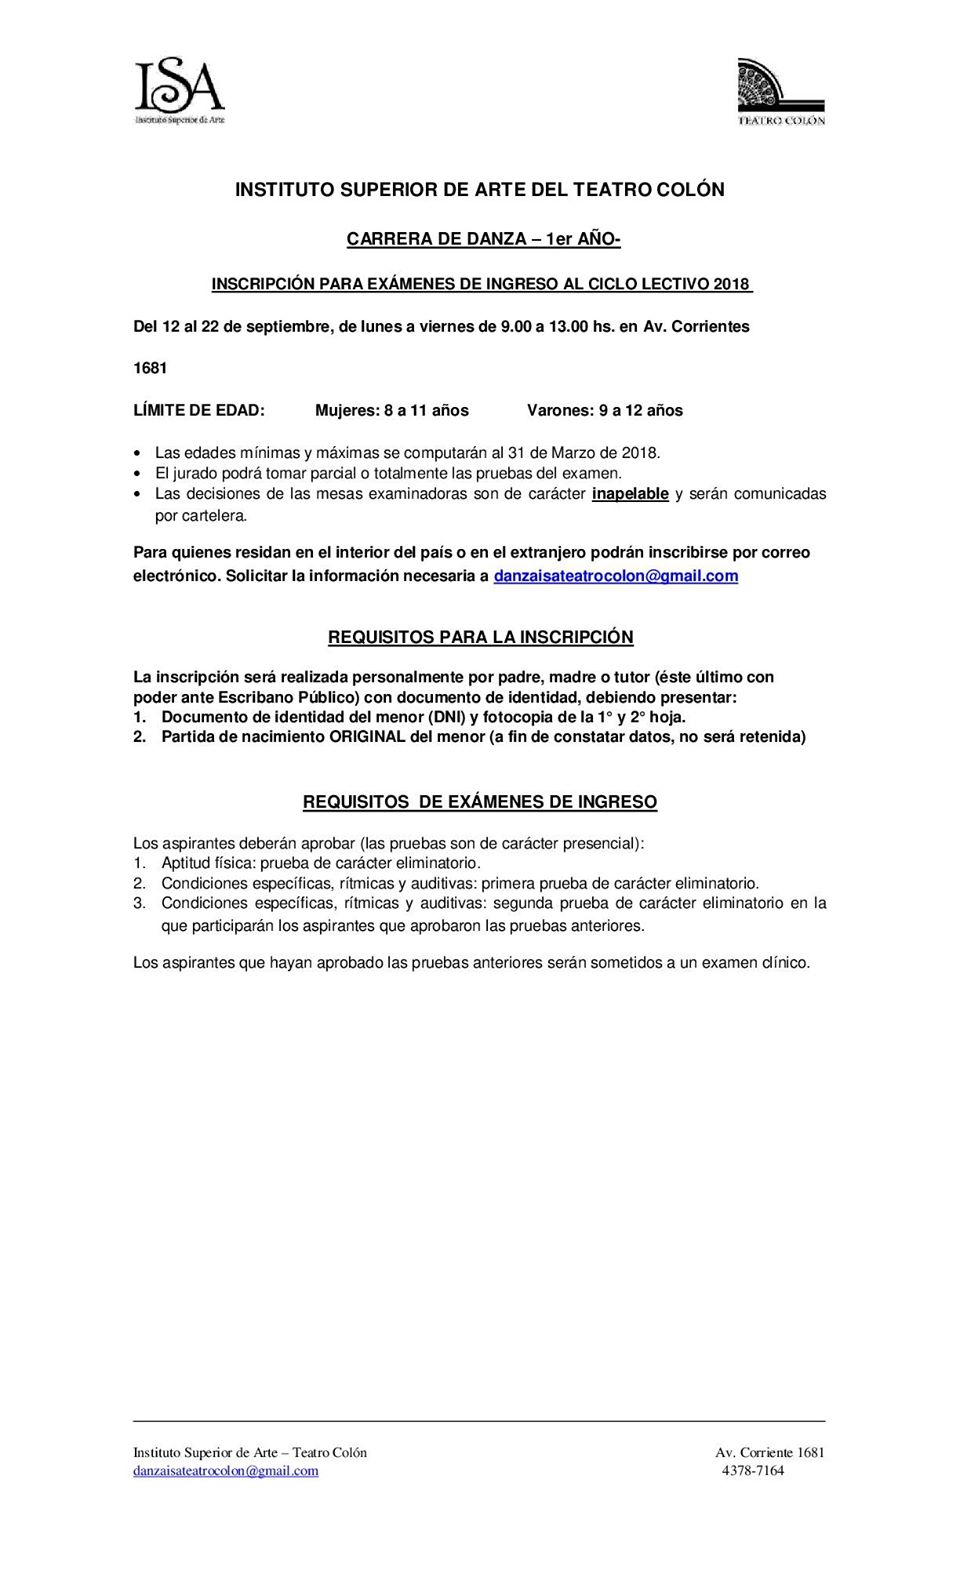 Instituto Superior de Arte del Teatro Colón | Revol - Revista de Danza